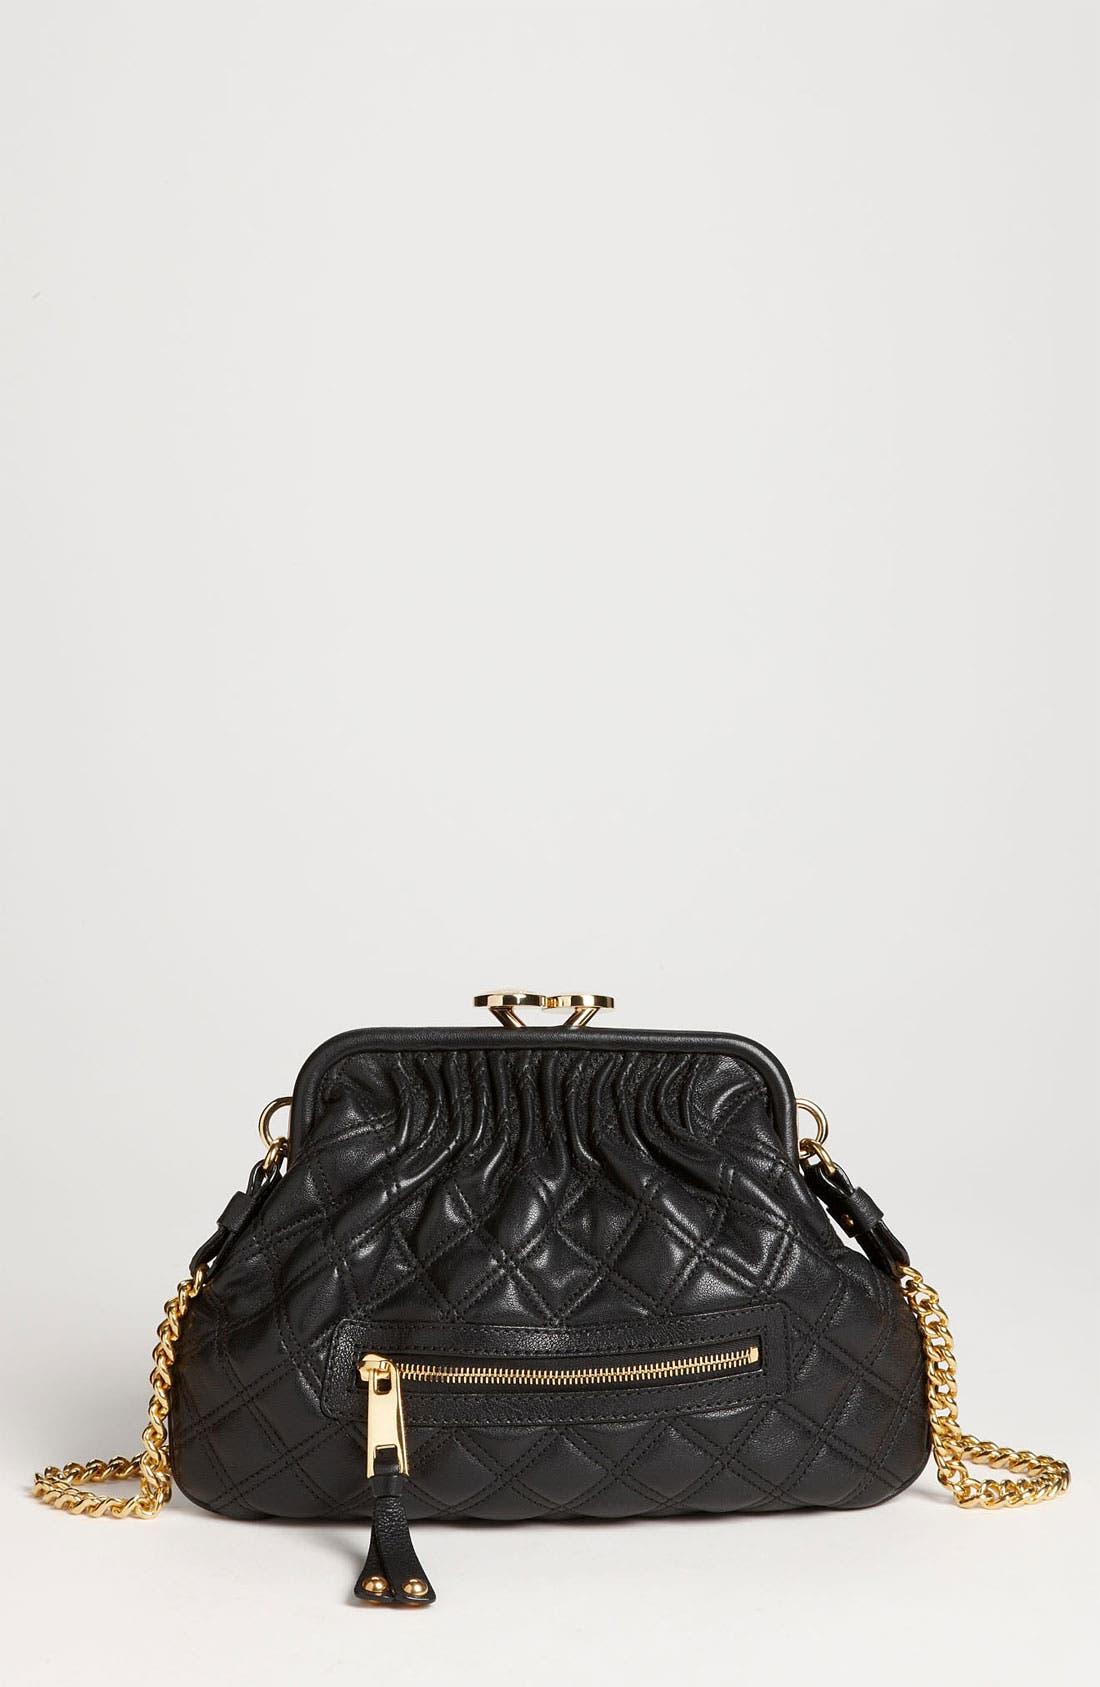 Alternate Image 1 Selected - MARC JACOBS 'Little Stam' Leather Crossbody Bag